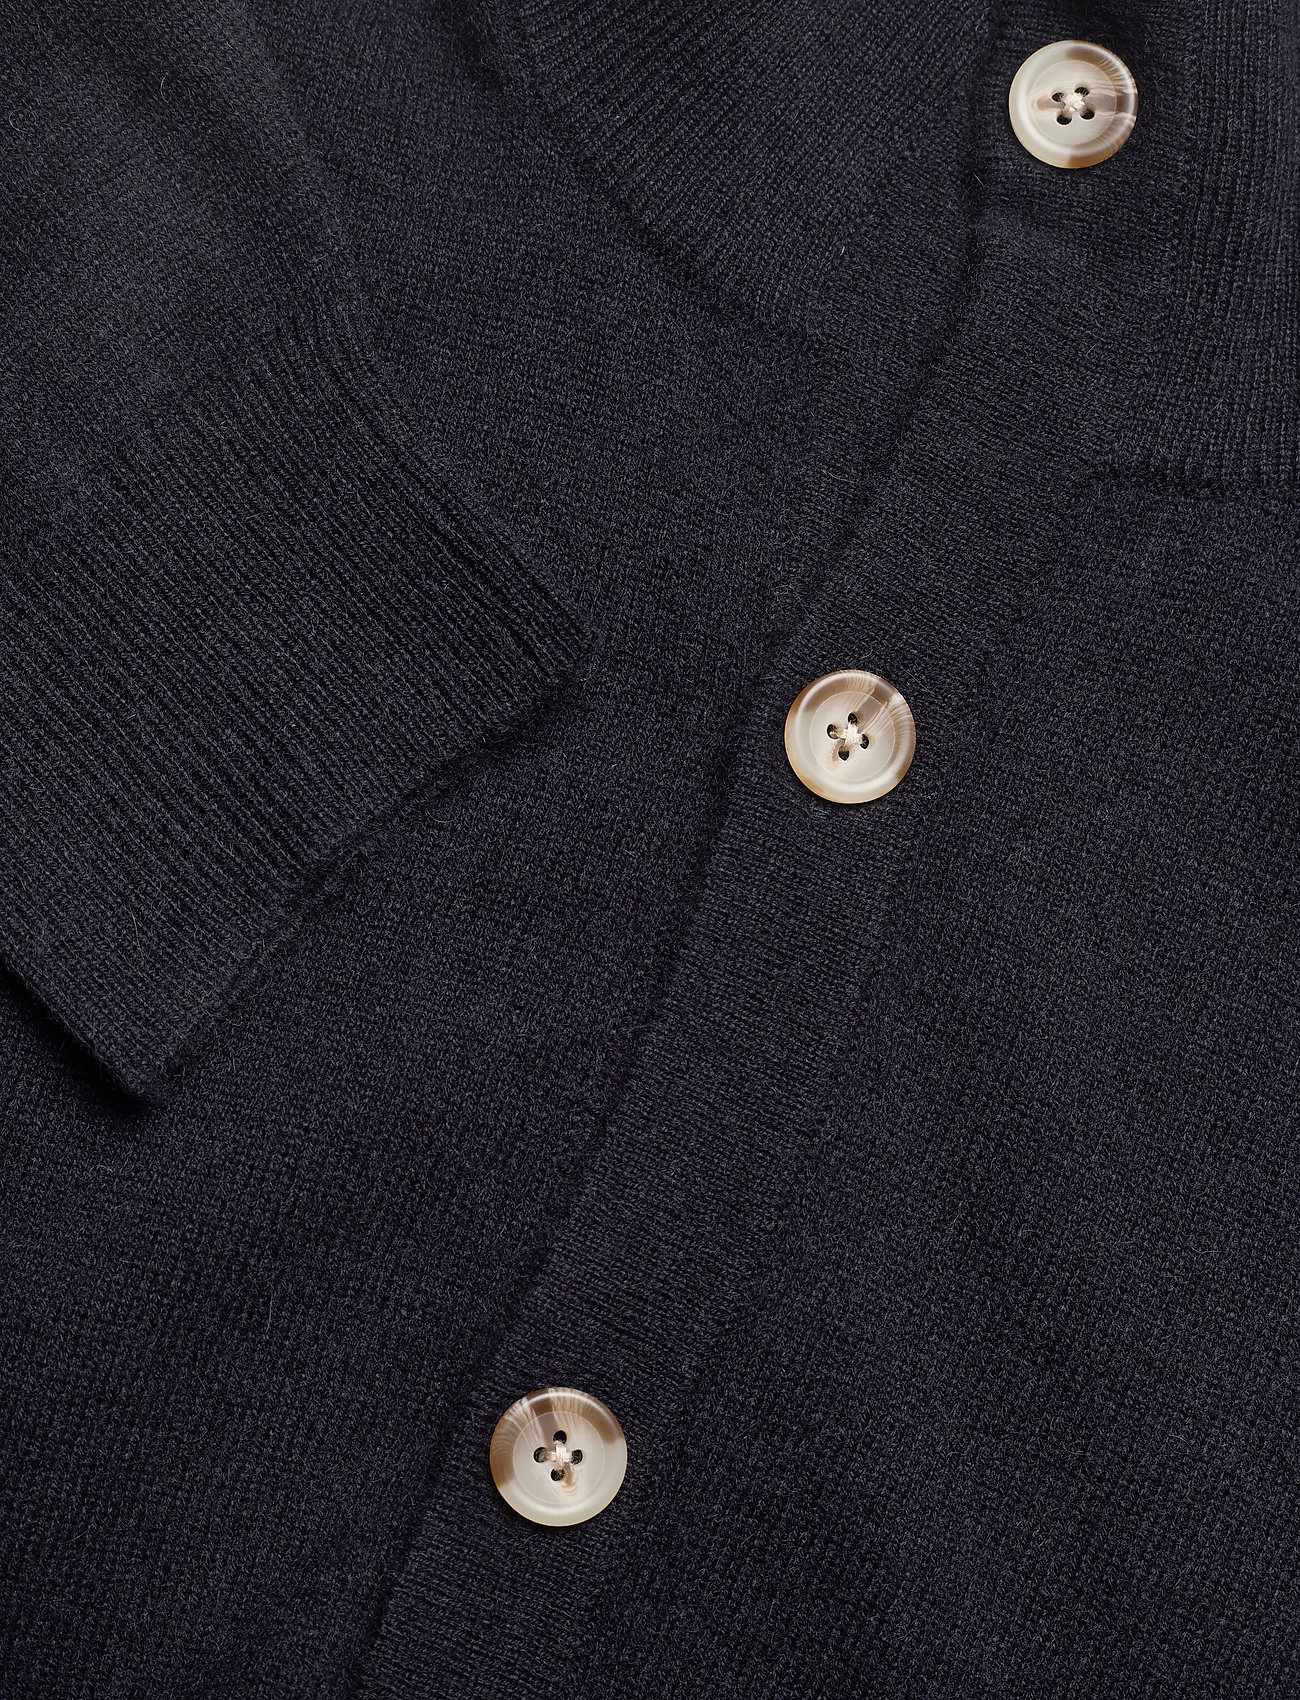 Davida Cashmere Man Cardigan Buttons - Strikkevarer NAVY - Menn Klær